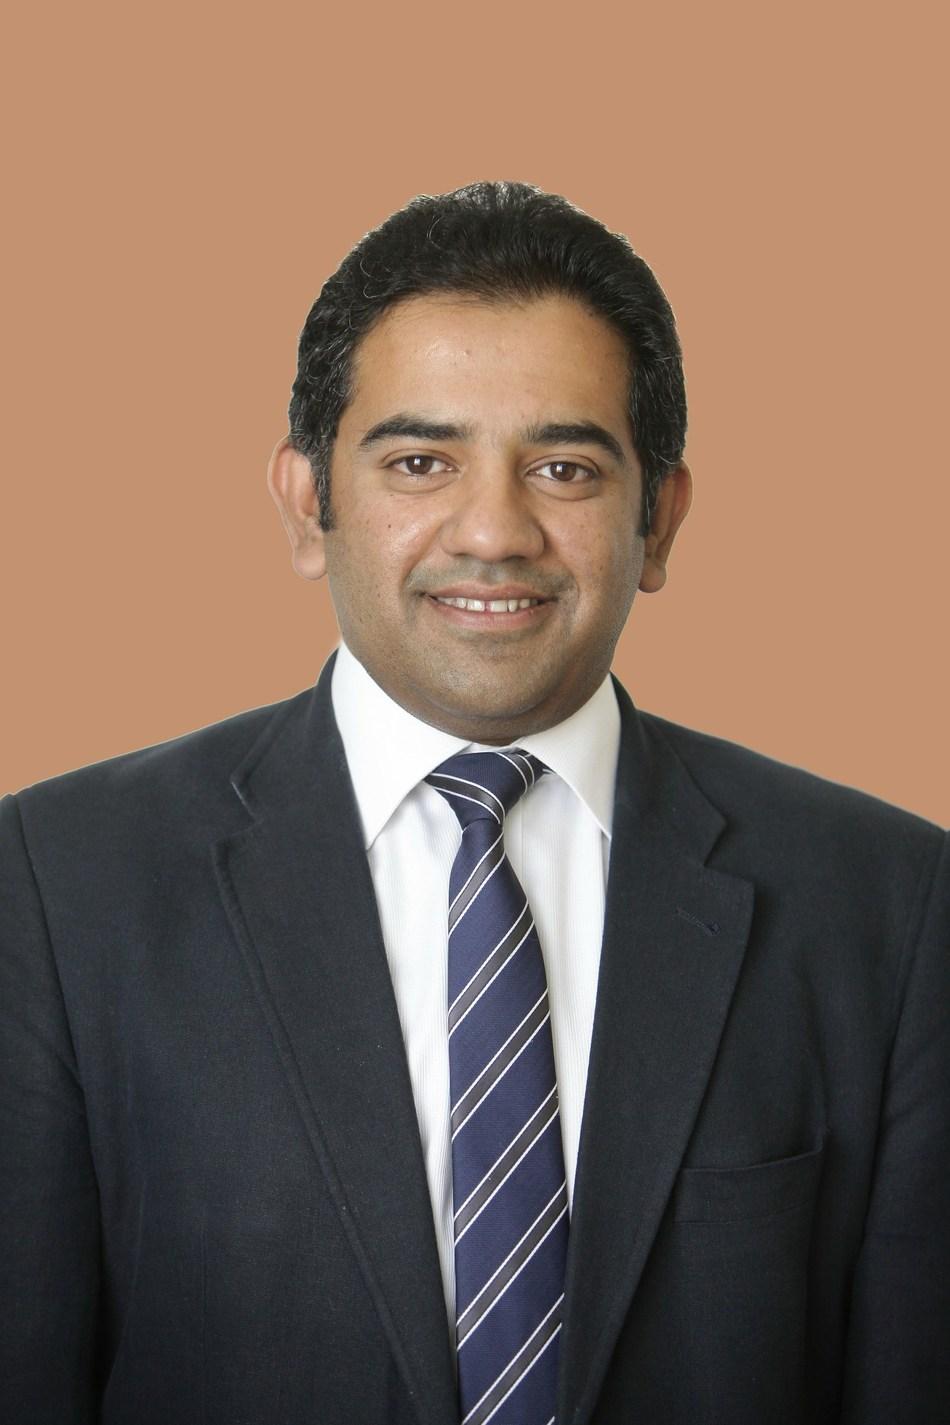 Dr. Irfan Khan, Consultant Ophthalmologist with special interest in Paediatric eye conditions, Strabismus, Adult and Paediatric Cataract, Moorfields Eye Hospital Dubai (PRNewsfoto/Moorfields Eye Hospital Dubai)